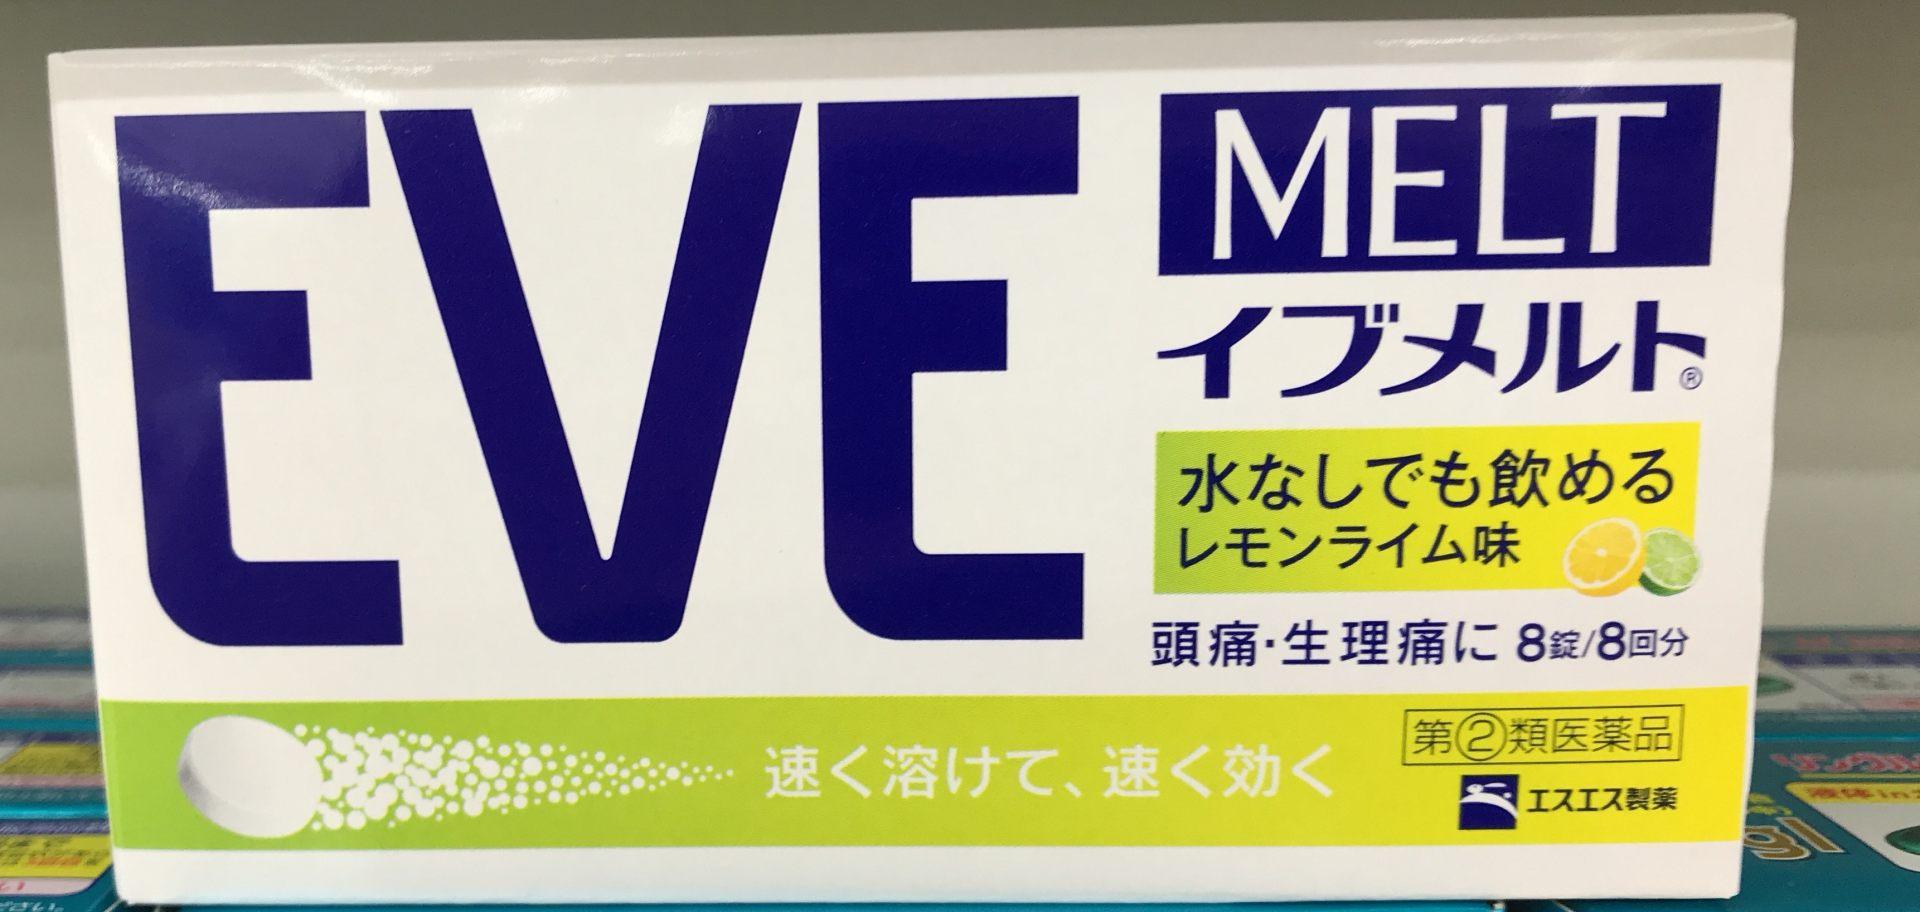 EVE MELT